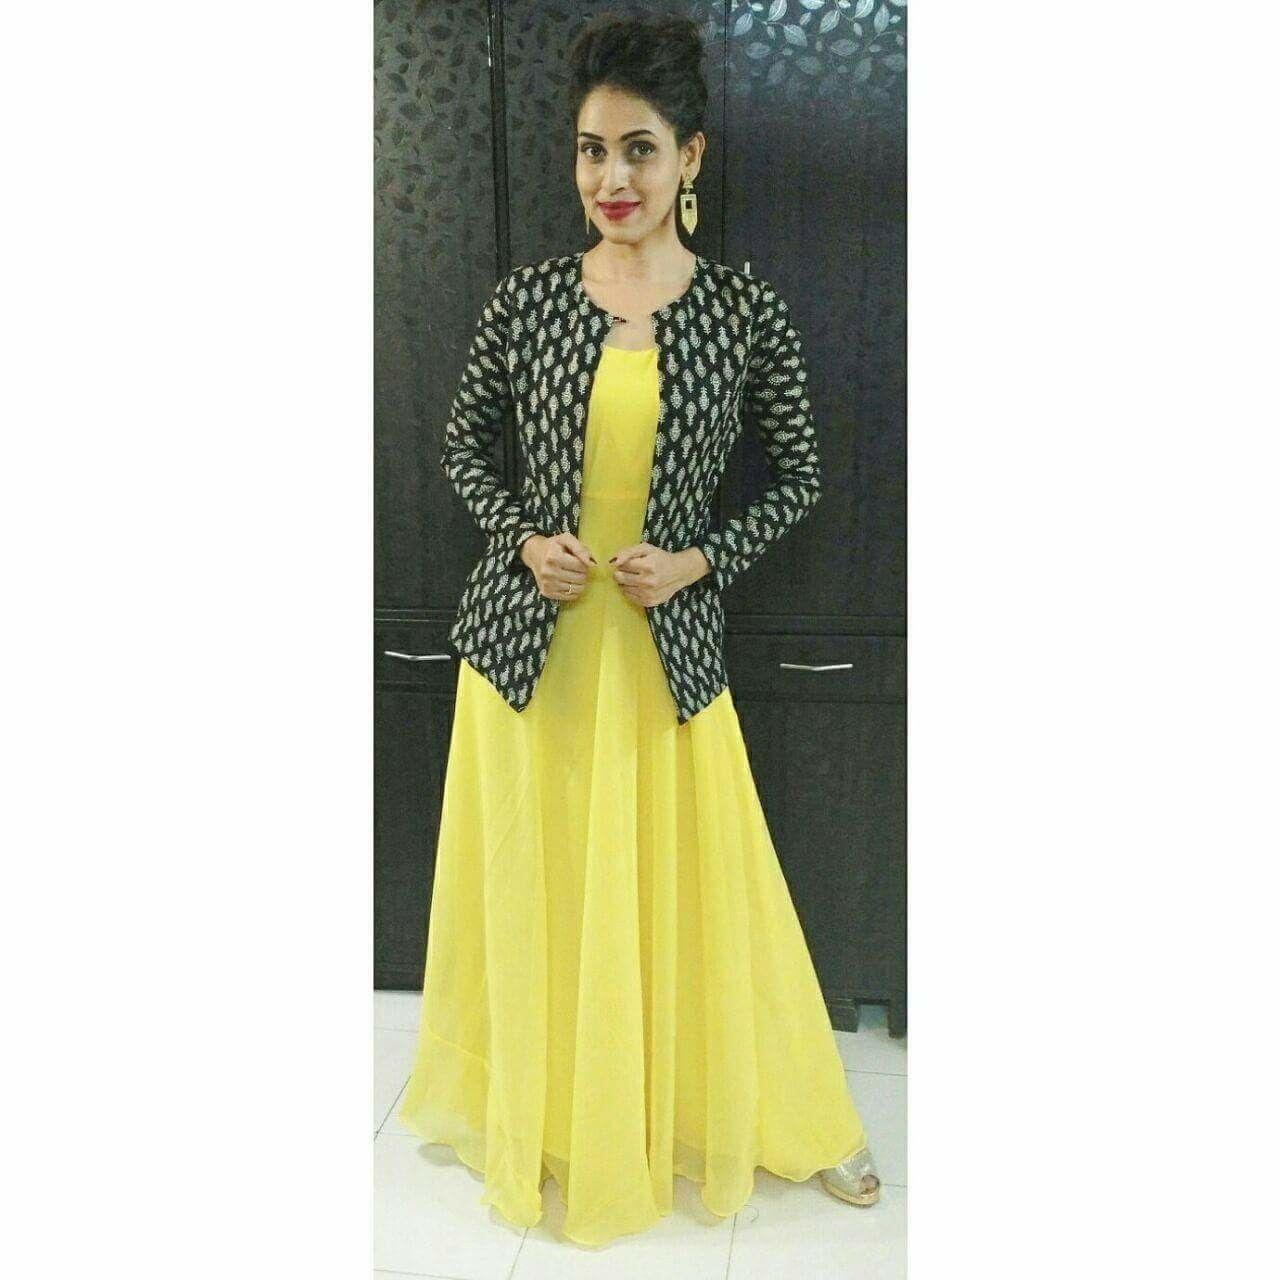 Anarkali With Jacket Dress Coats For Women Designer Party Wear Dresses Long Gown Design